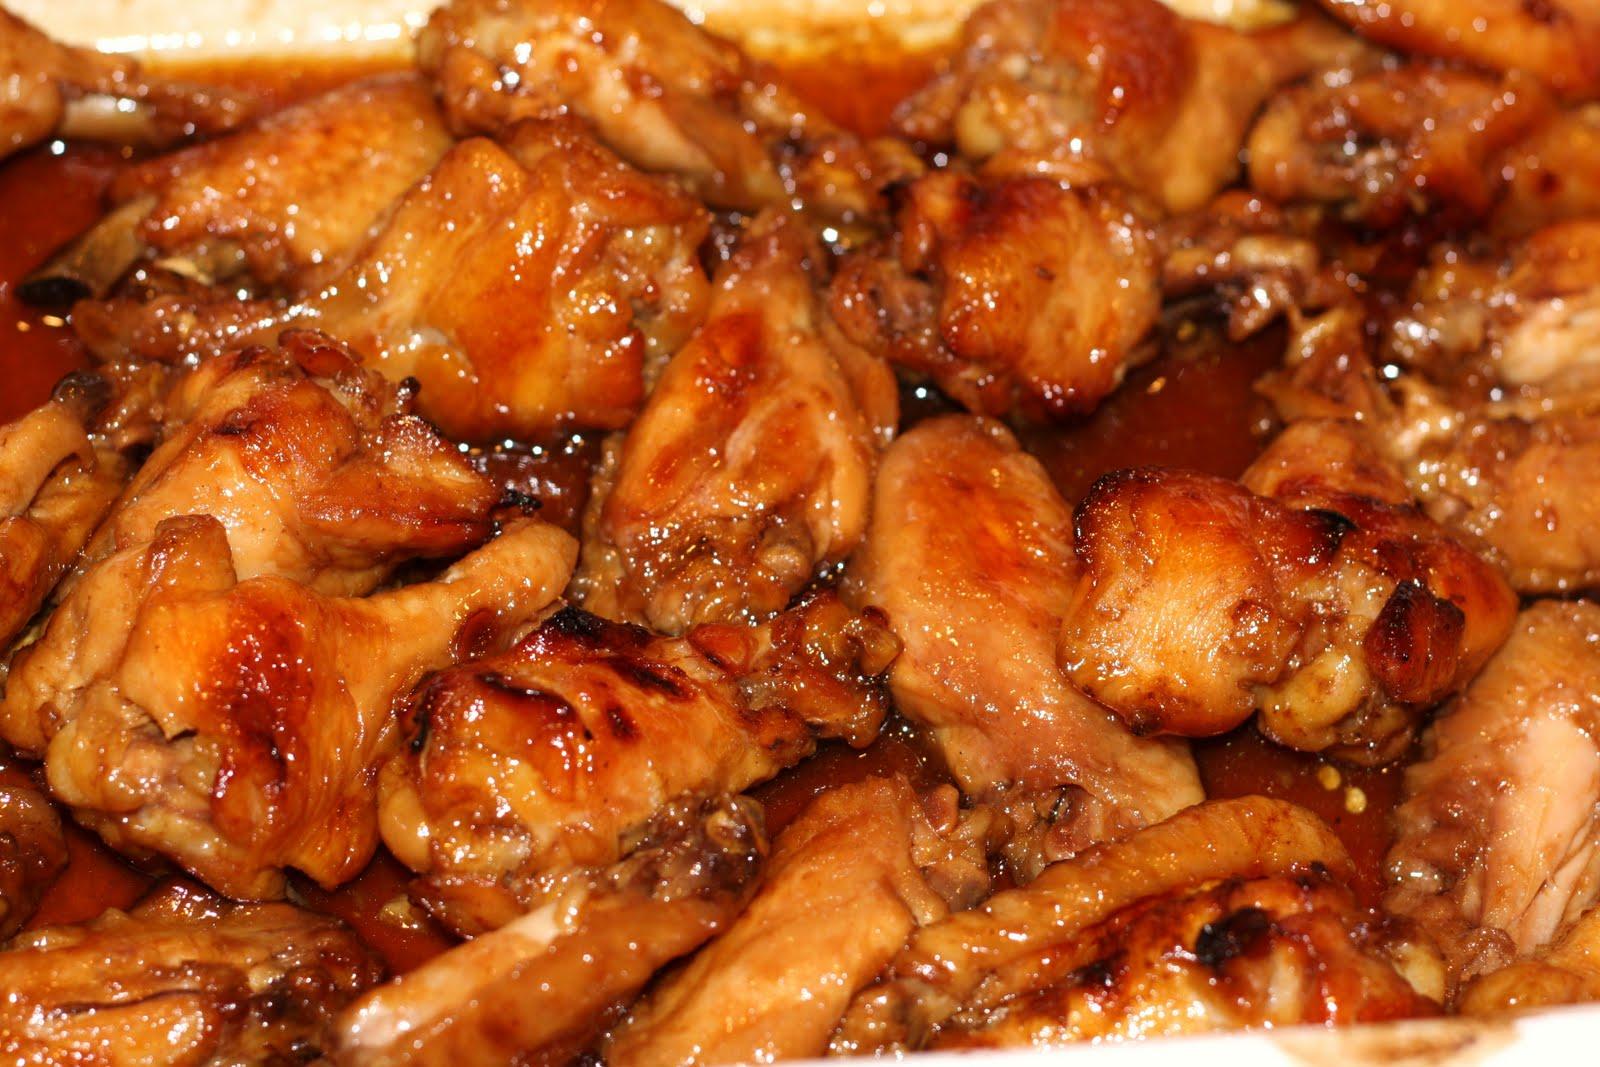 Sticky chicken wings hot